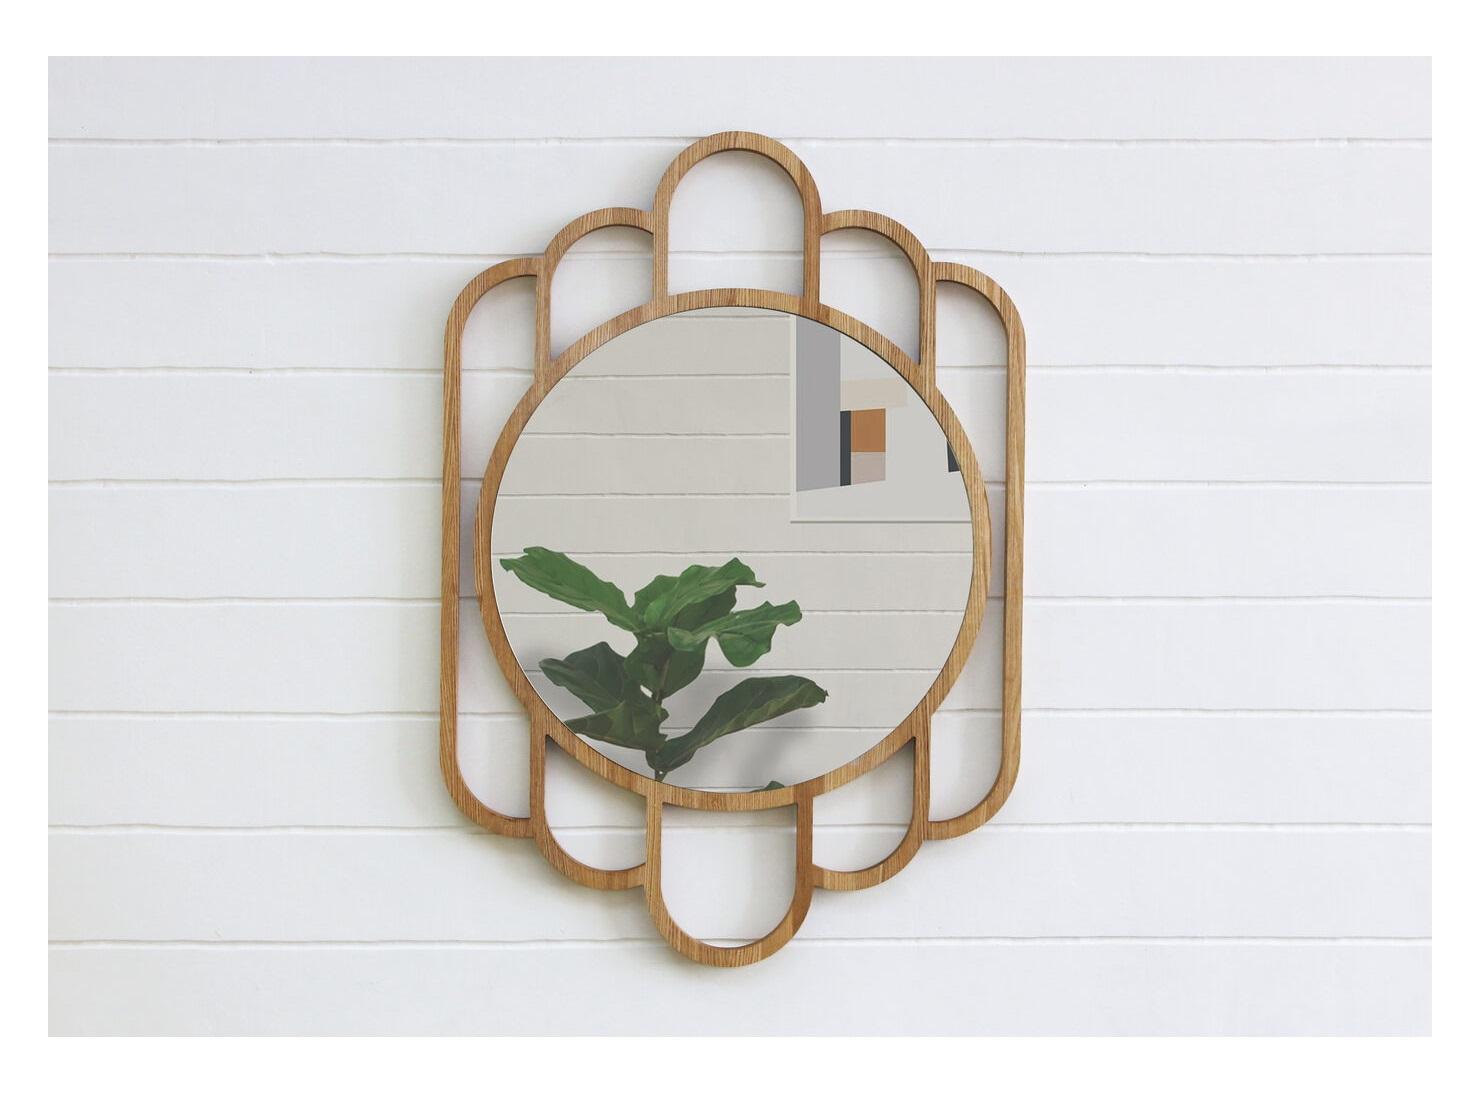 Деревянное зеркало santa b (banska) коричневый 65x80x5 см.